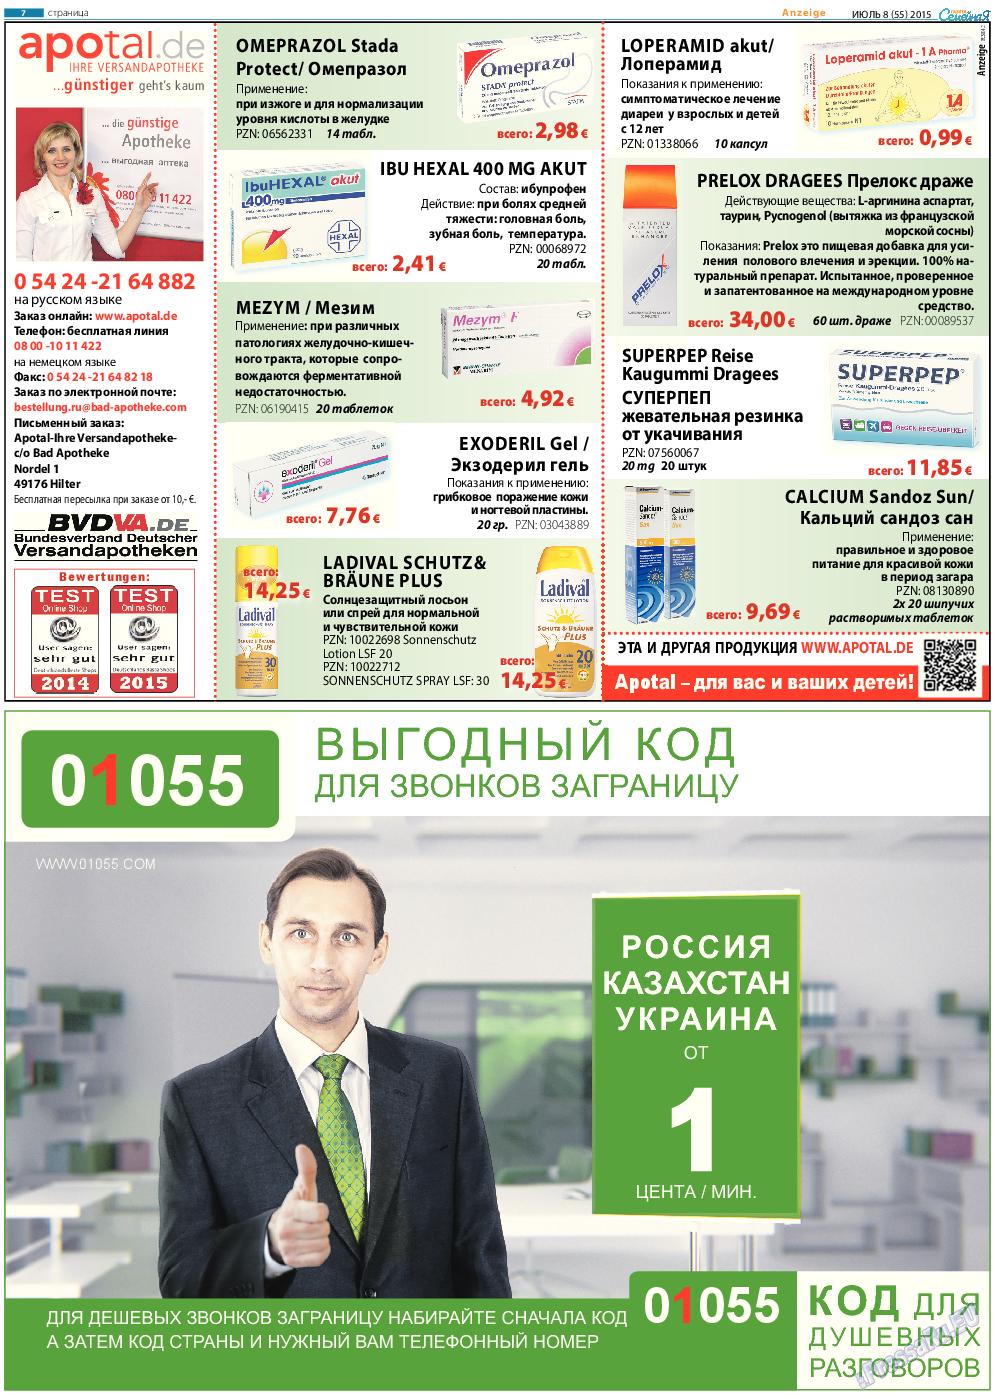 Семейная газета (газета). 2015 год, номер 8, стр. 7